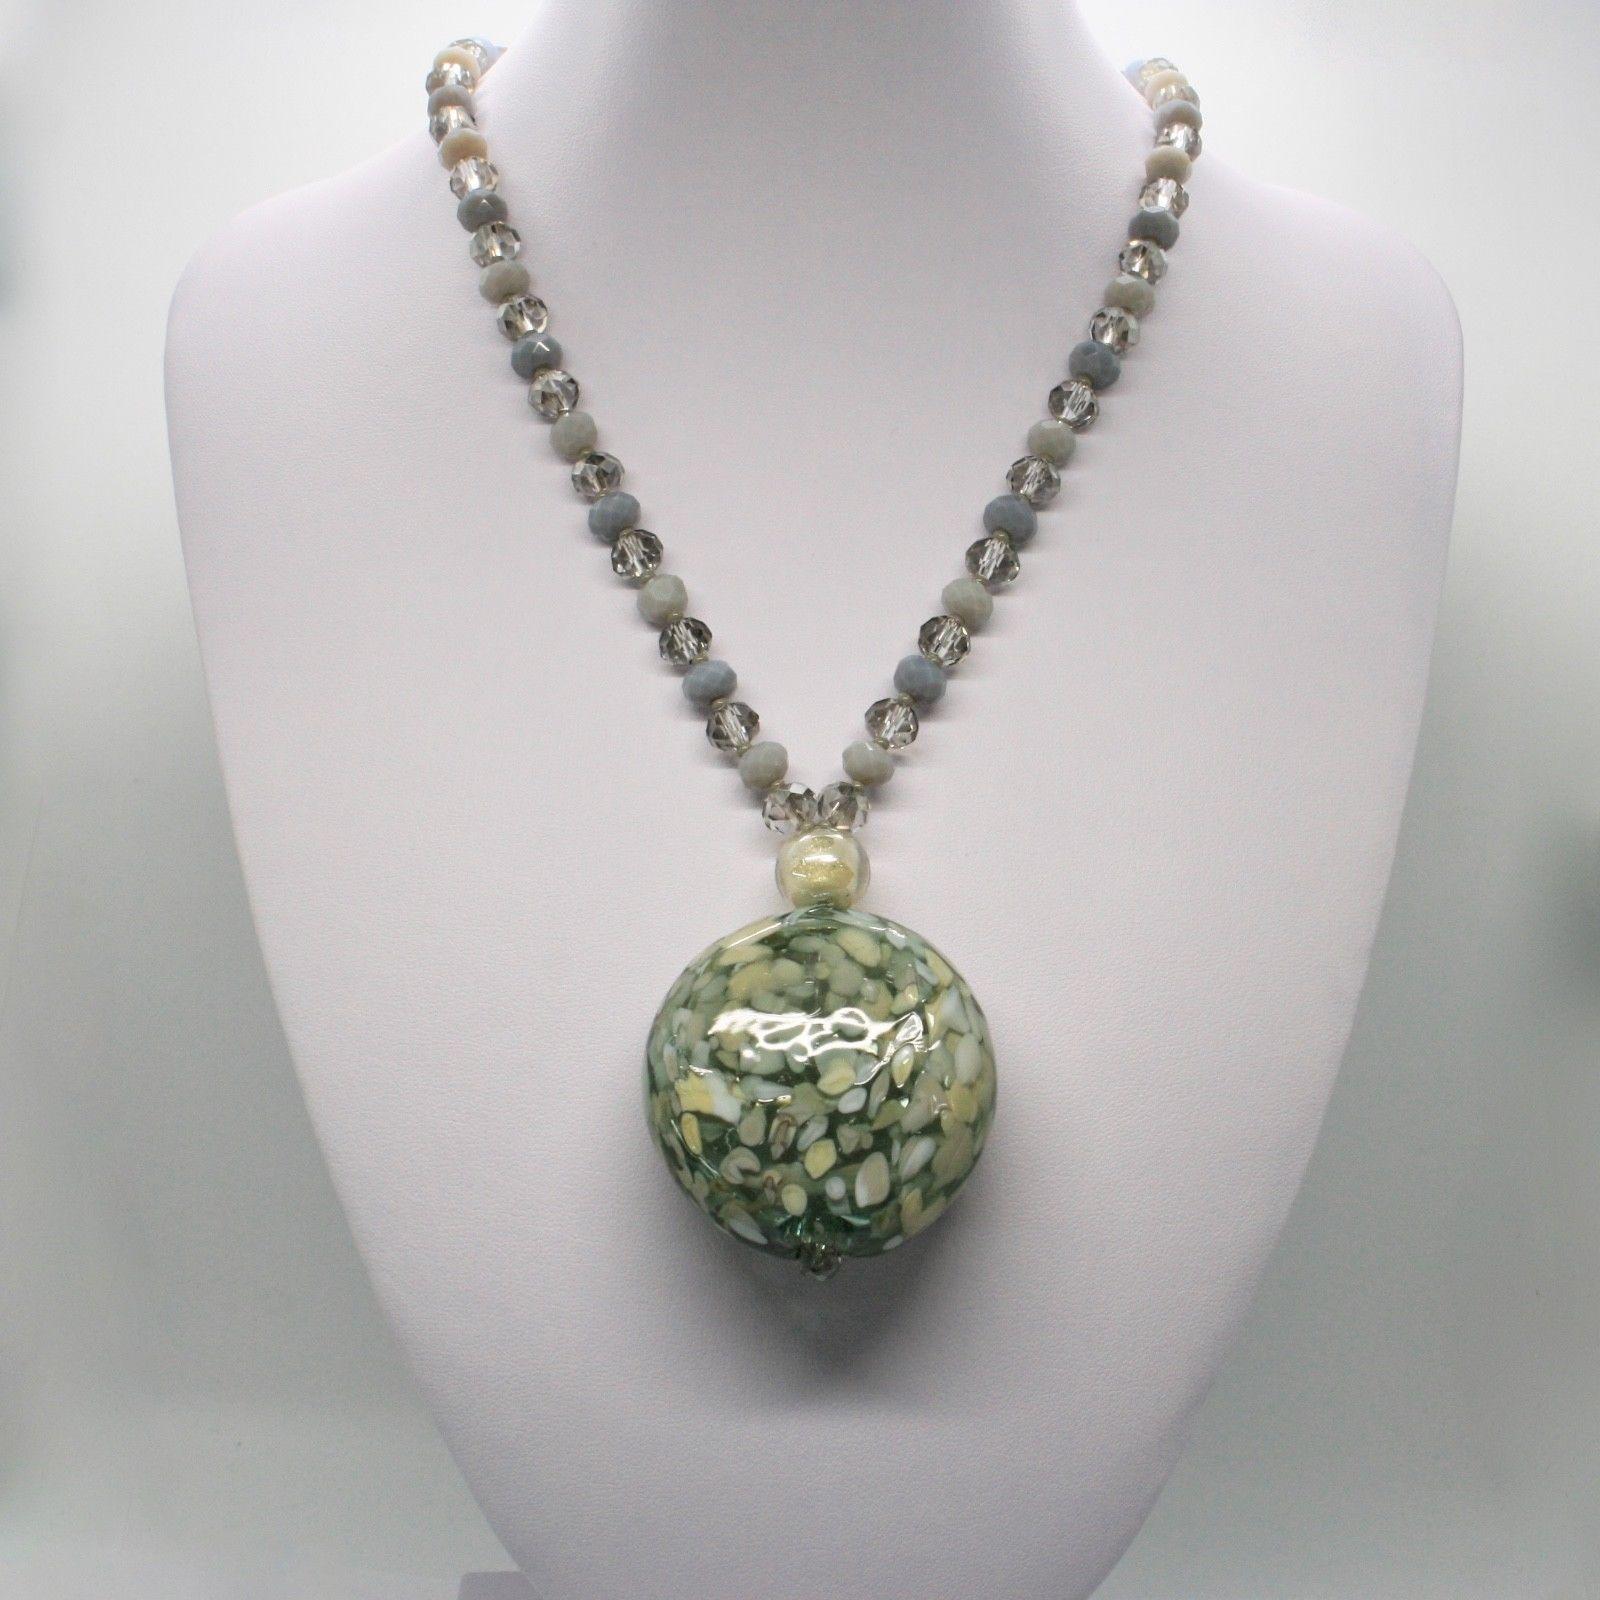 NECKLACE ANTICA MURRINA VENEZIA WITH MURANO GLASS GREEN GRAY BEIGE COA76A34